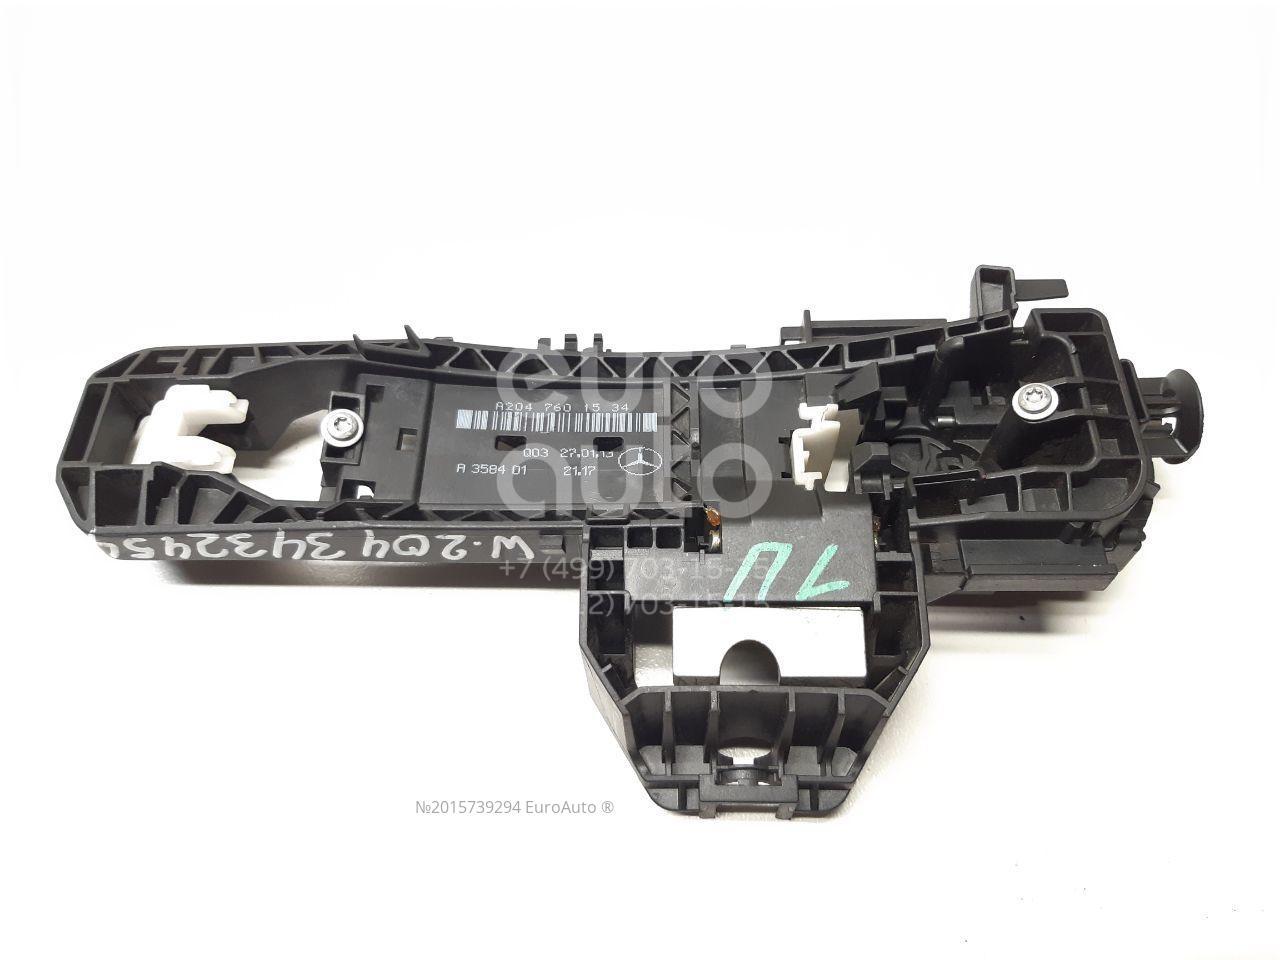 Кронштейн ручки для Mercedes Benz W204 2007-2015;GLK-Class X204 2008-2015;W212 E-Klasse 2009>;W166 M-Klasse (ML/GLE) 2011> - Фото №1